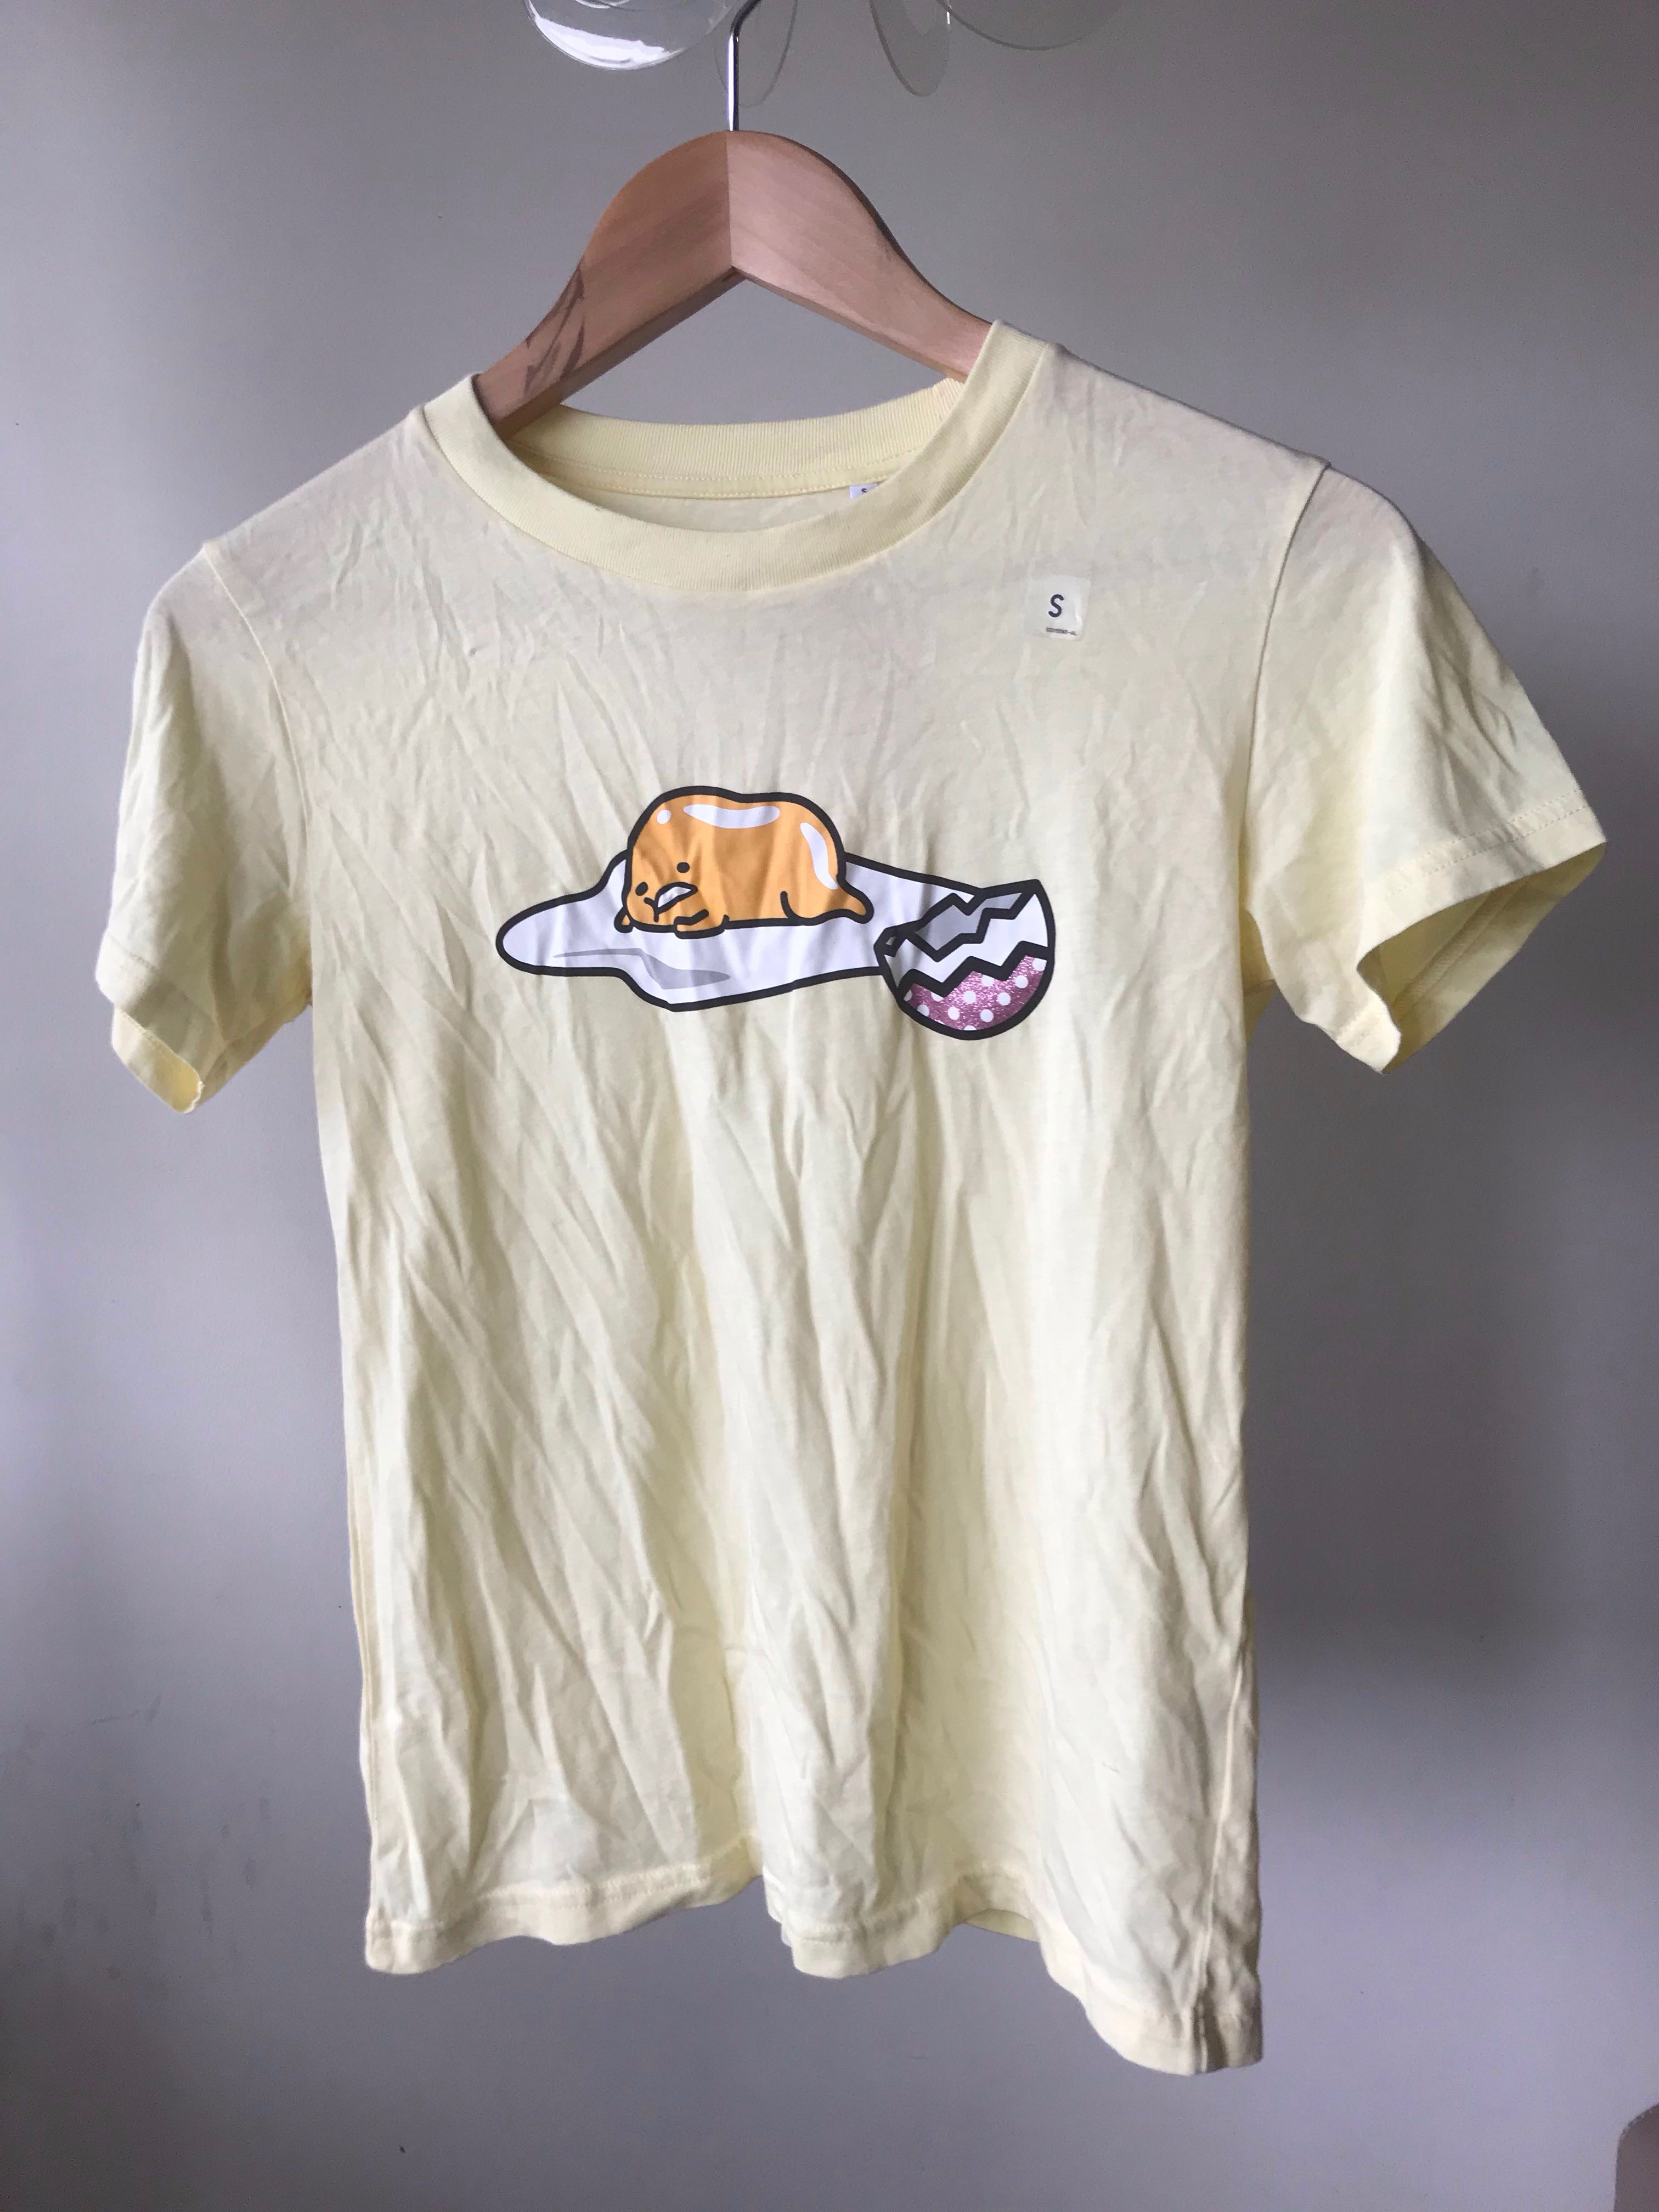 1f3b4193 [IN][BNWT] sanrio x uniqlo gudetama shirt, Women's Fashion, Clothes, Tops  on Carousell